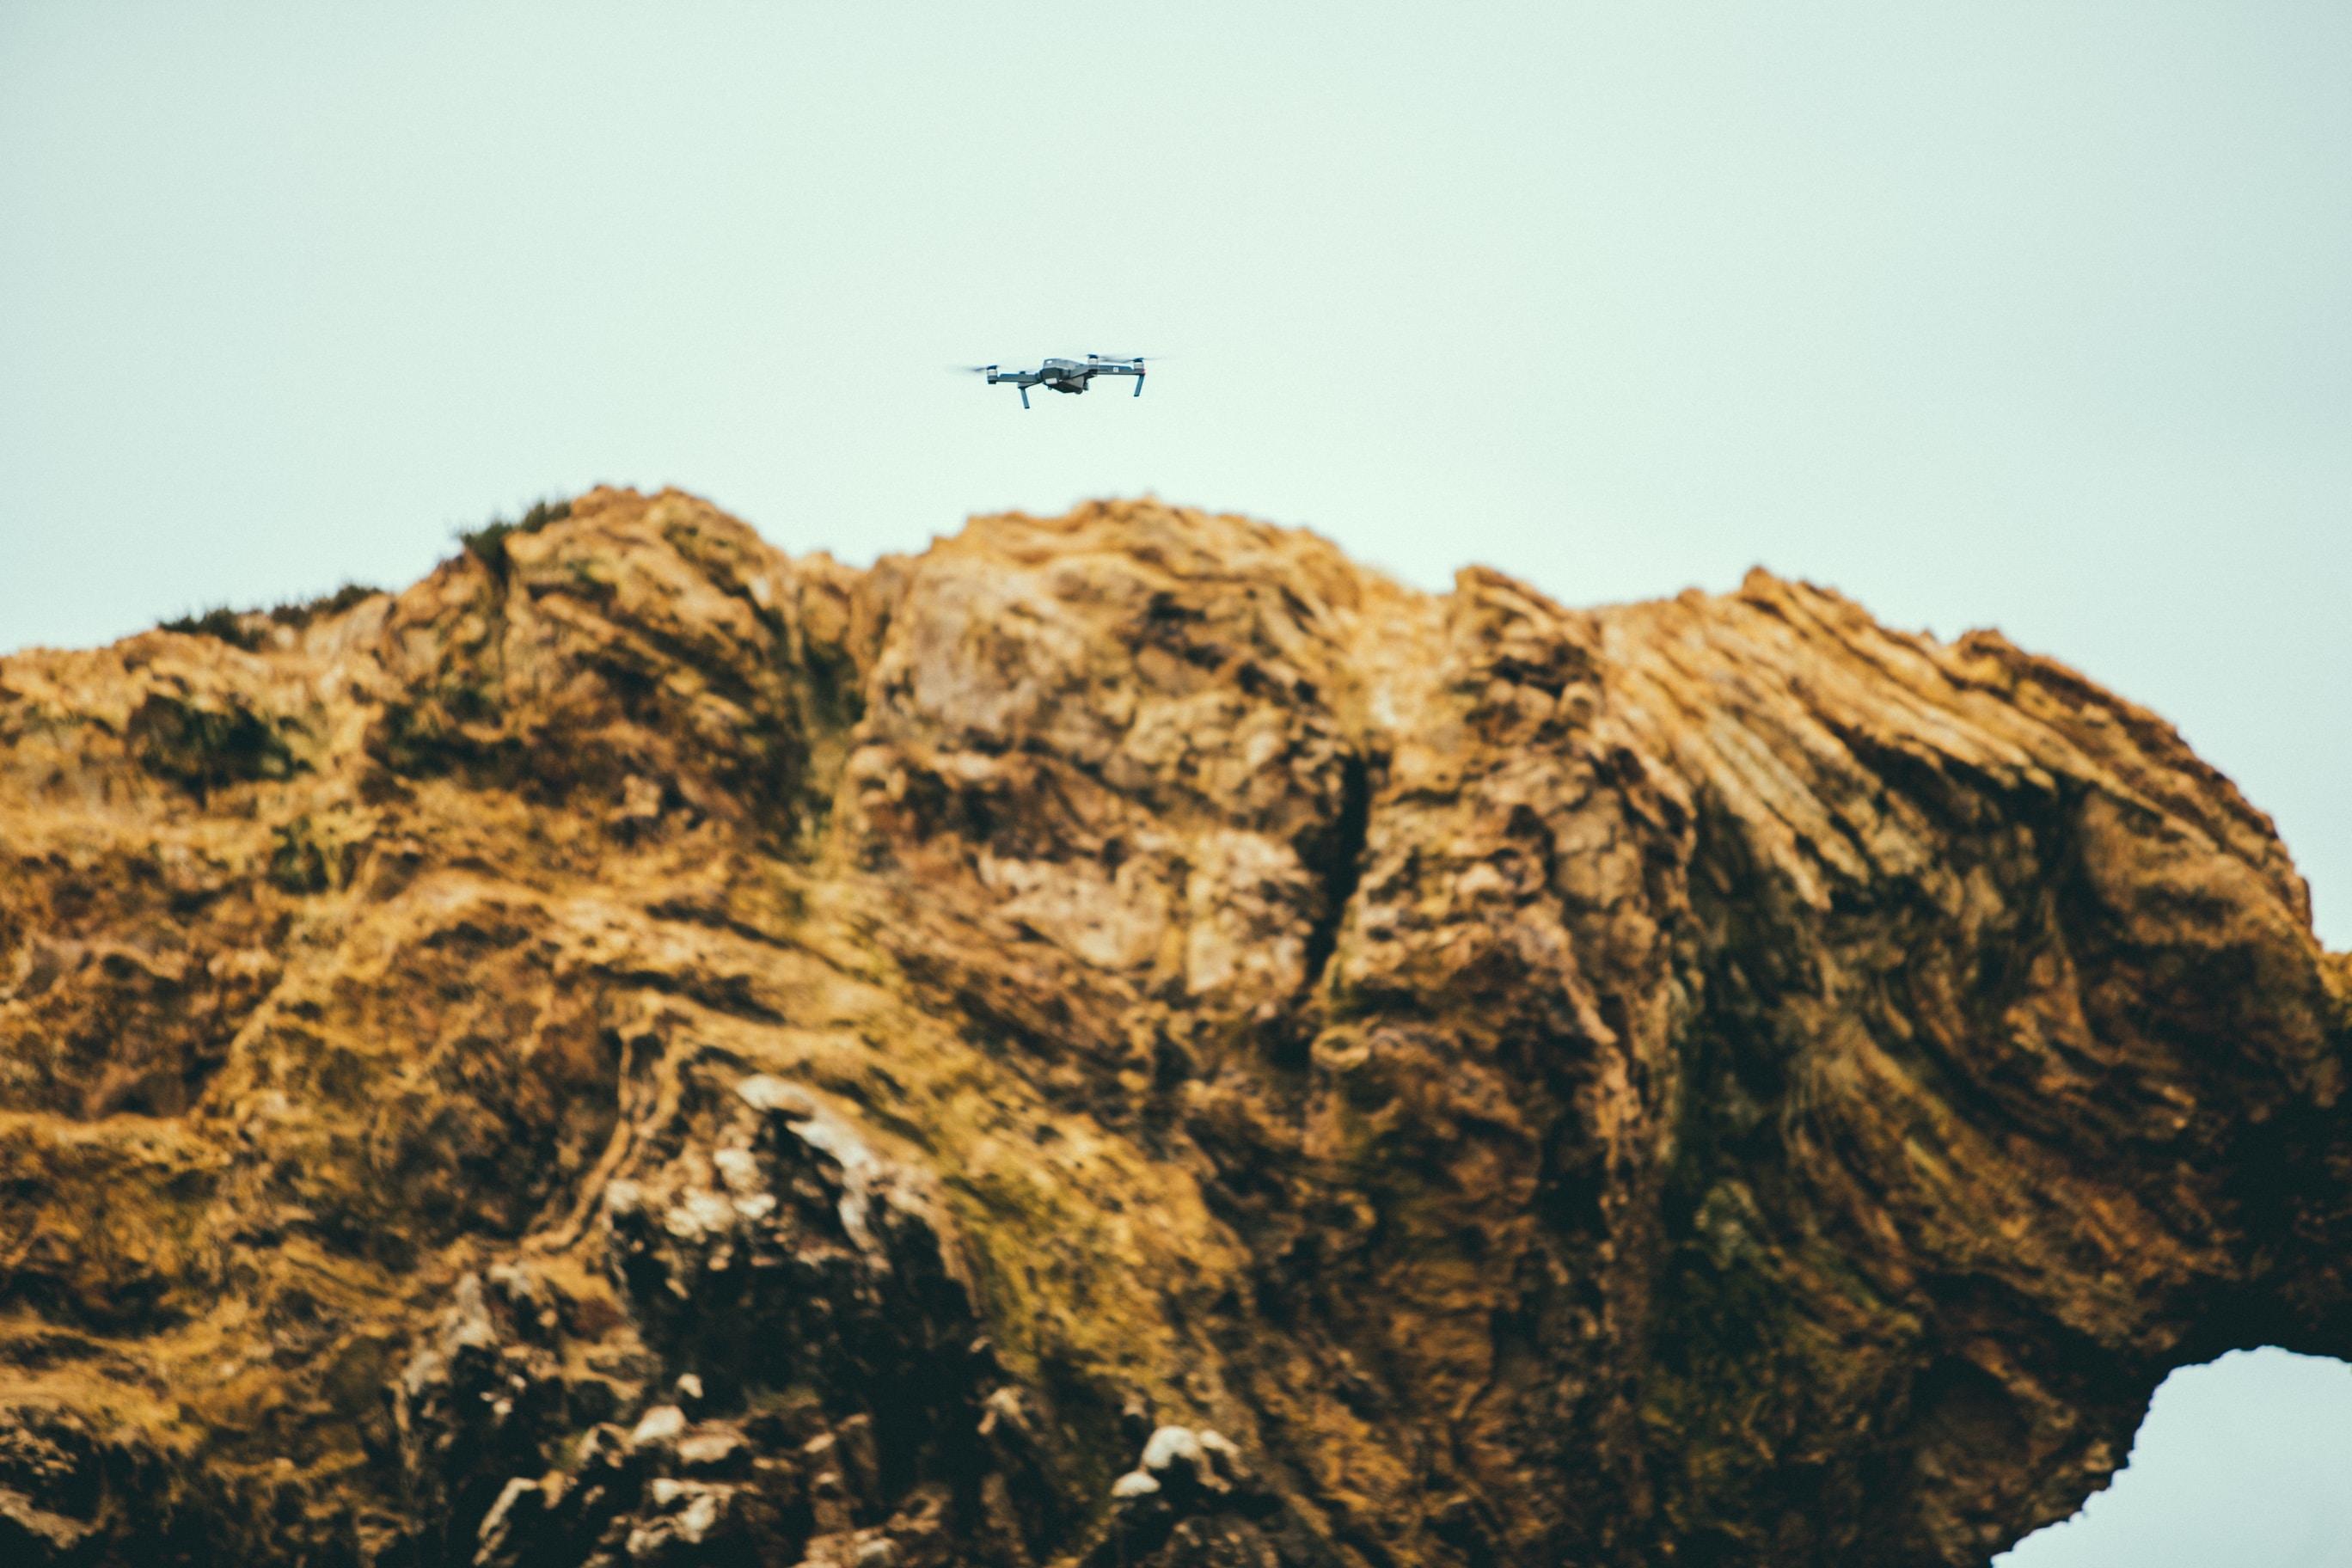 drone on brown concrete stone